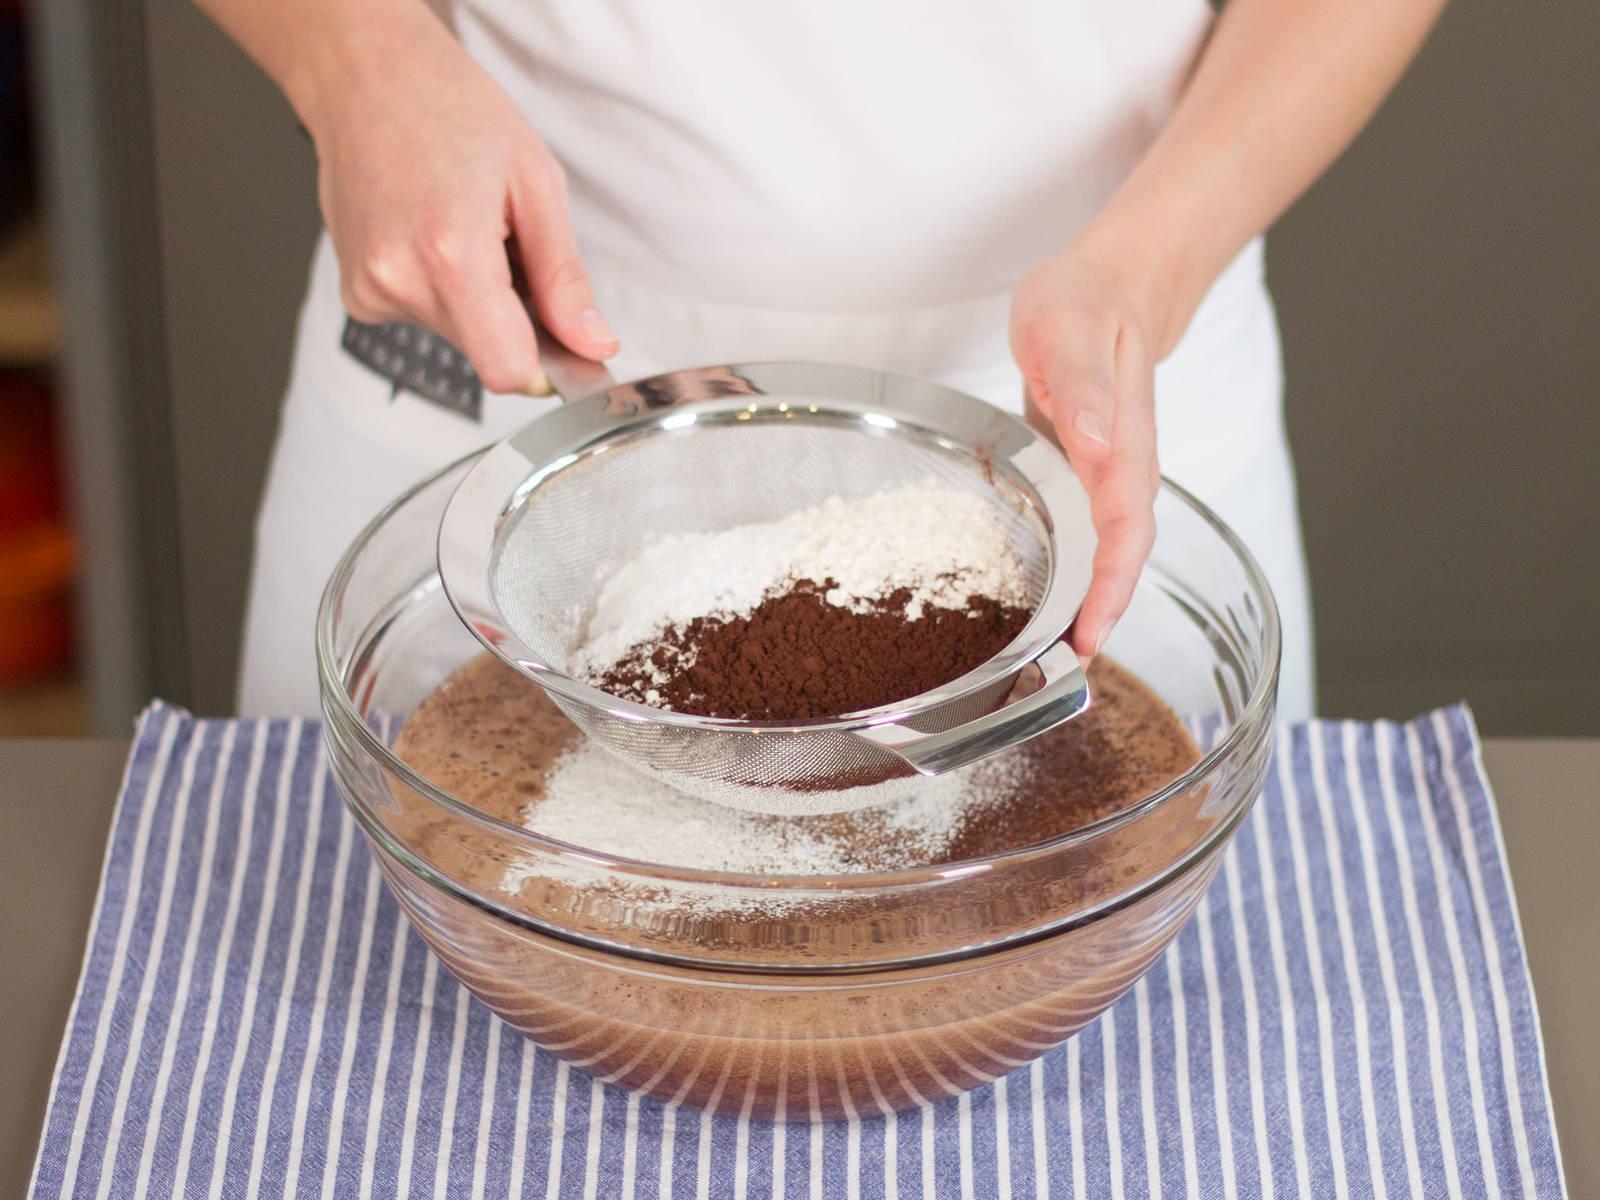 Sift flour, cocoa powder, baking powder, and salt into the dough. Stir to combine.